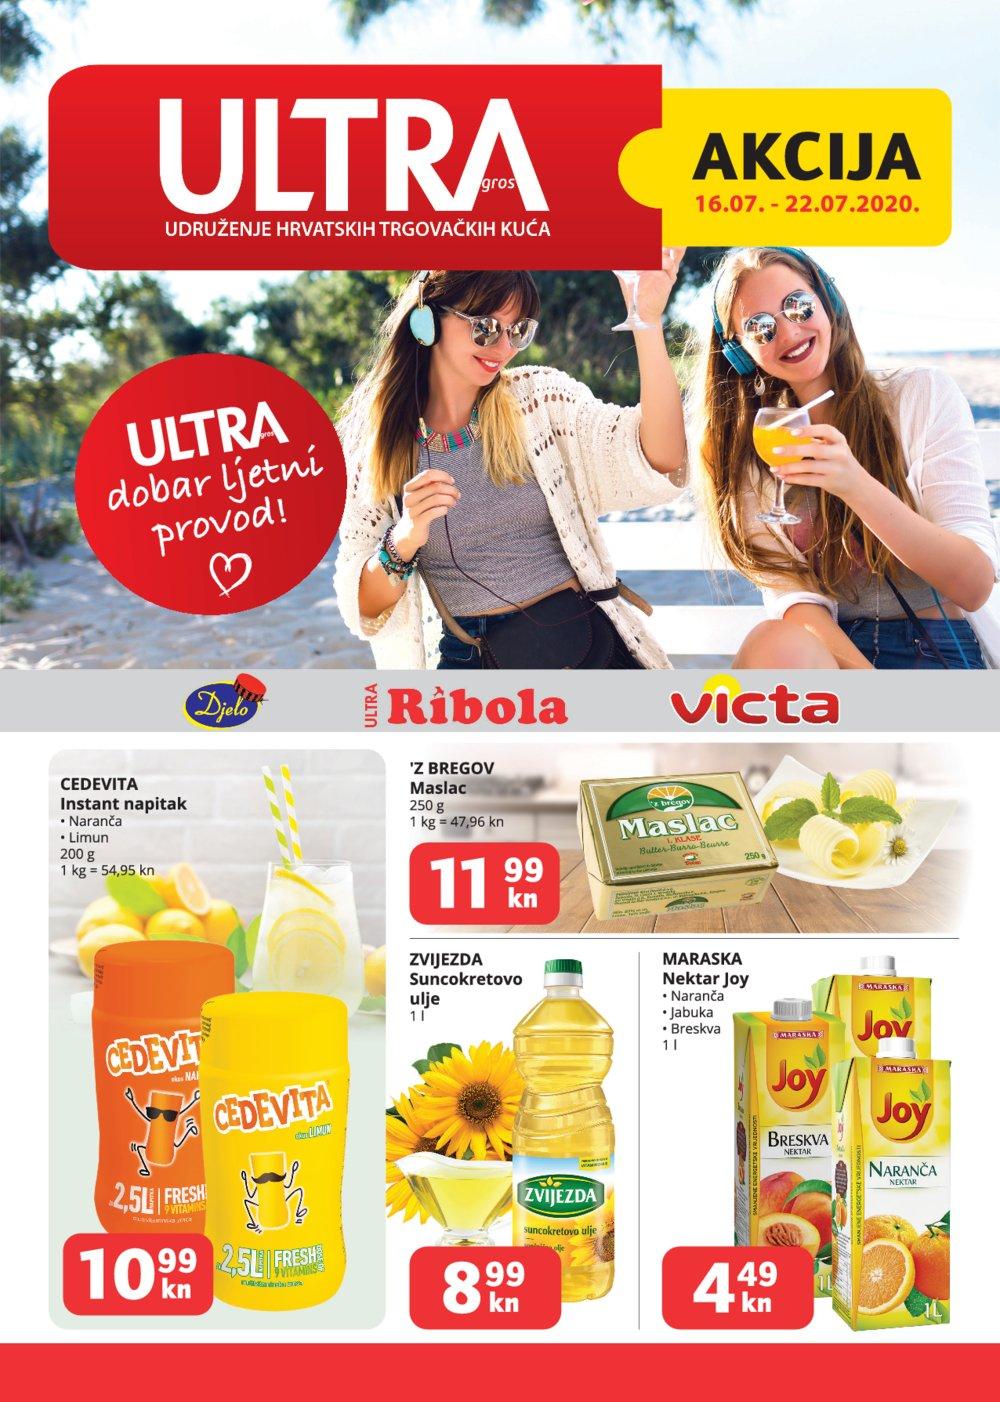 Ribola katalog Ultra gros Akcija 16.07.-22.07.2020.